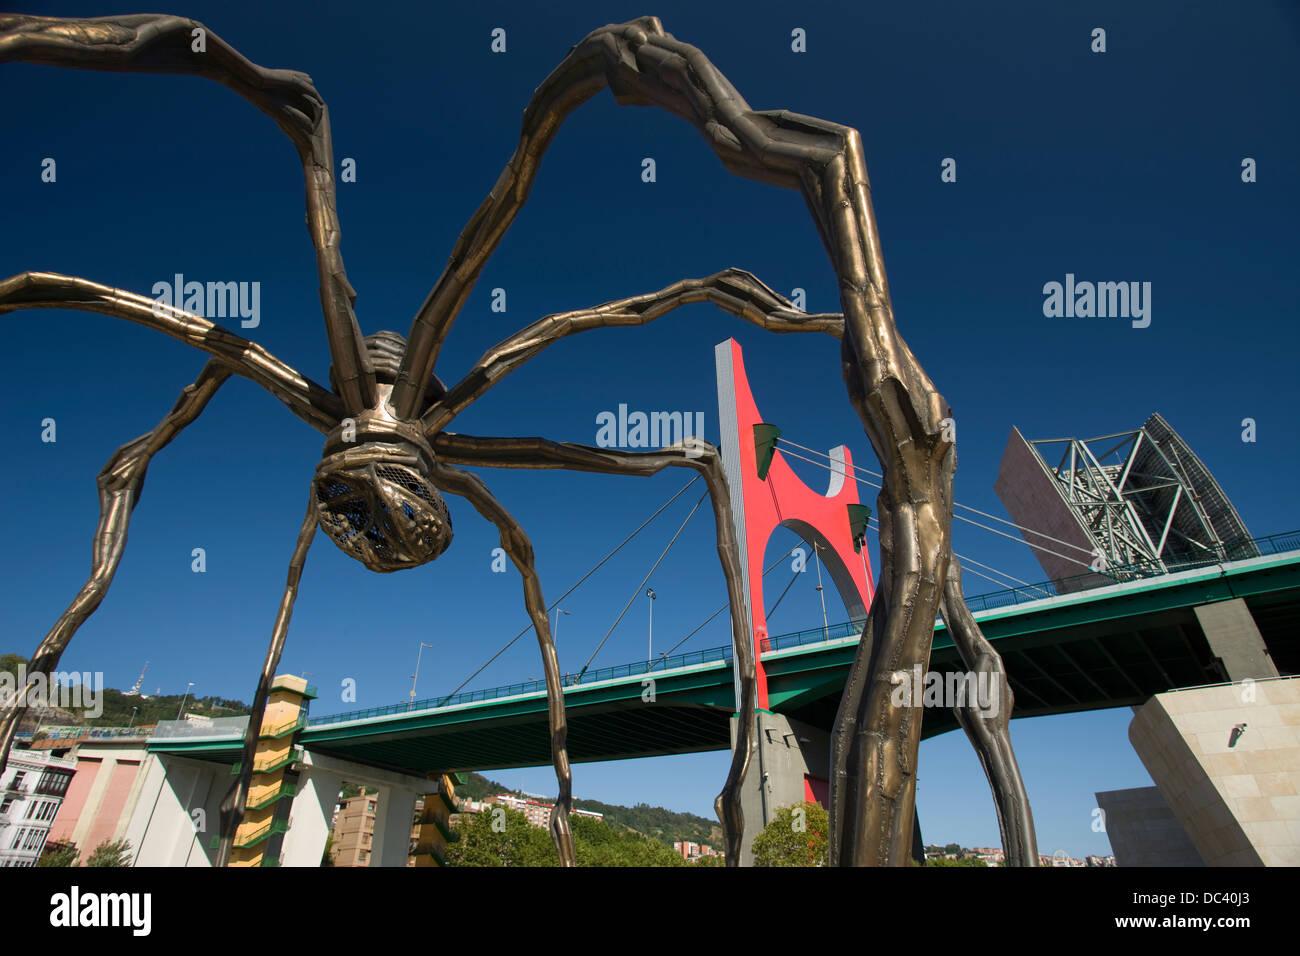 MAMAN (©LOUISE BOURGEOIS 2000) SPIDER GUGGENHEIM MUSEUM OF MODERN ART (©FRANK GEHRY 1997) BILBAO BASQUE - Stock Image